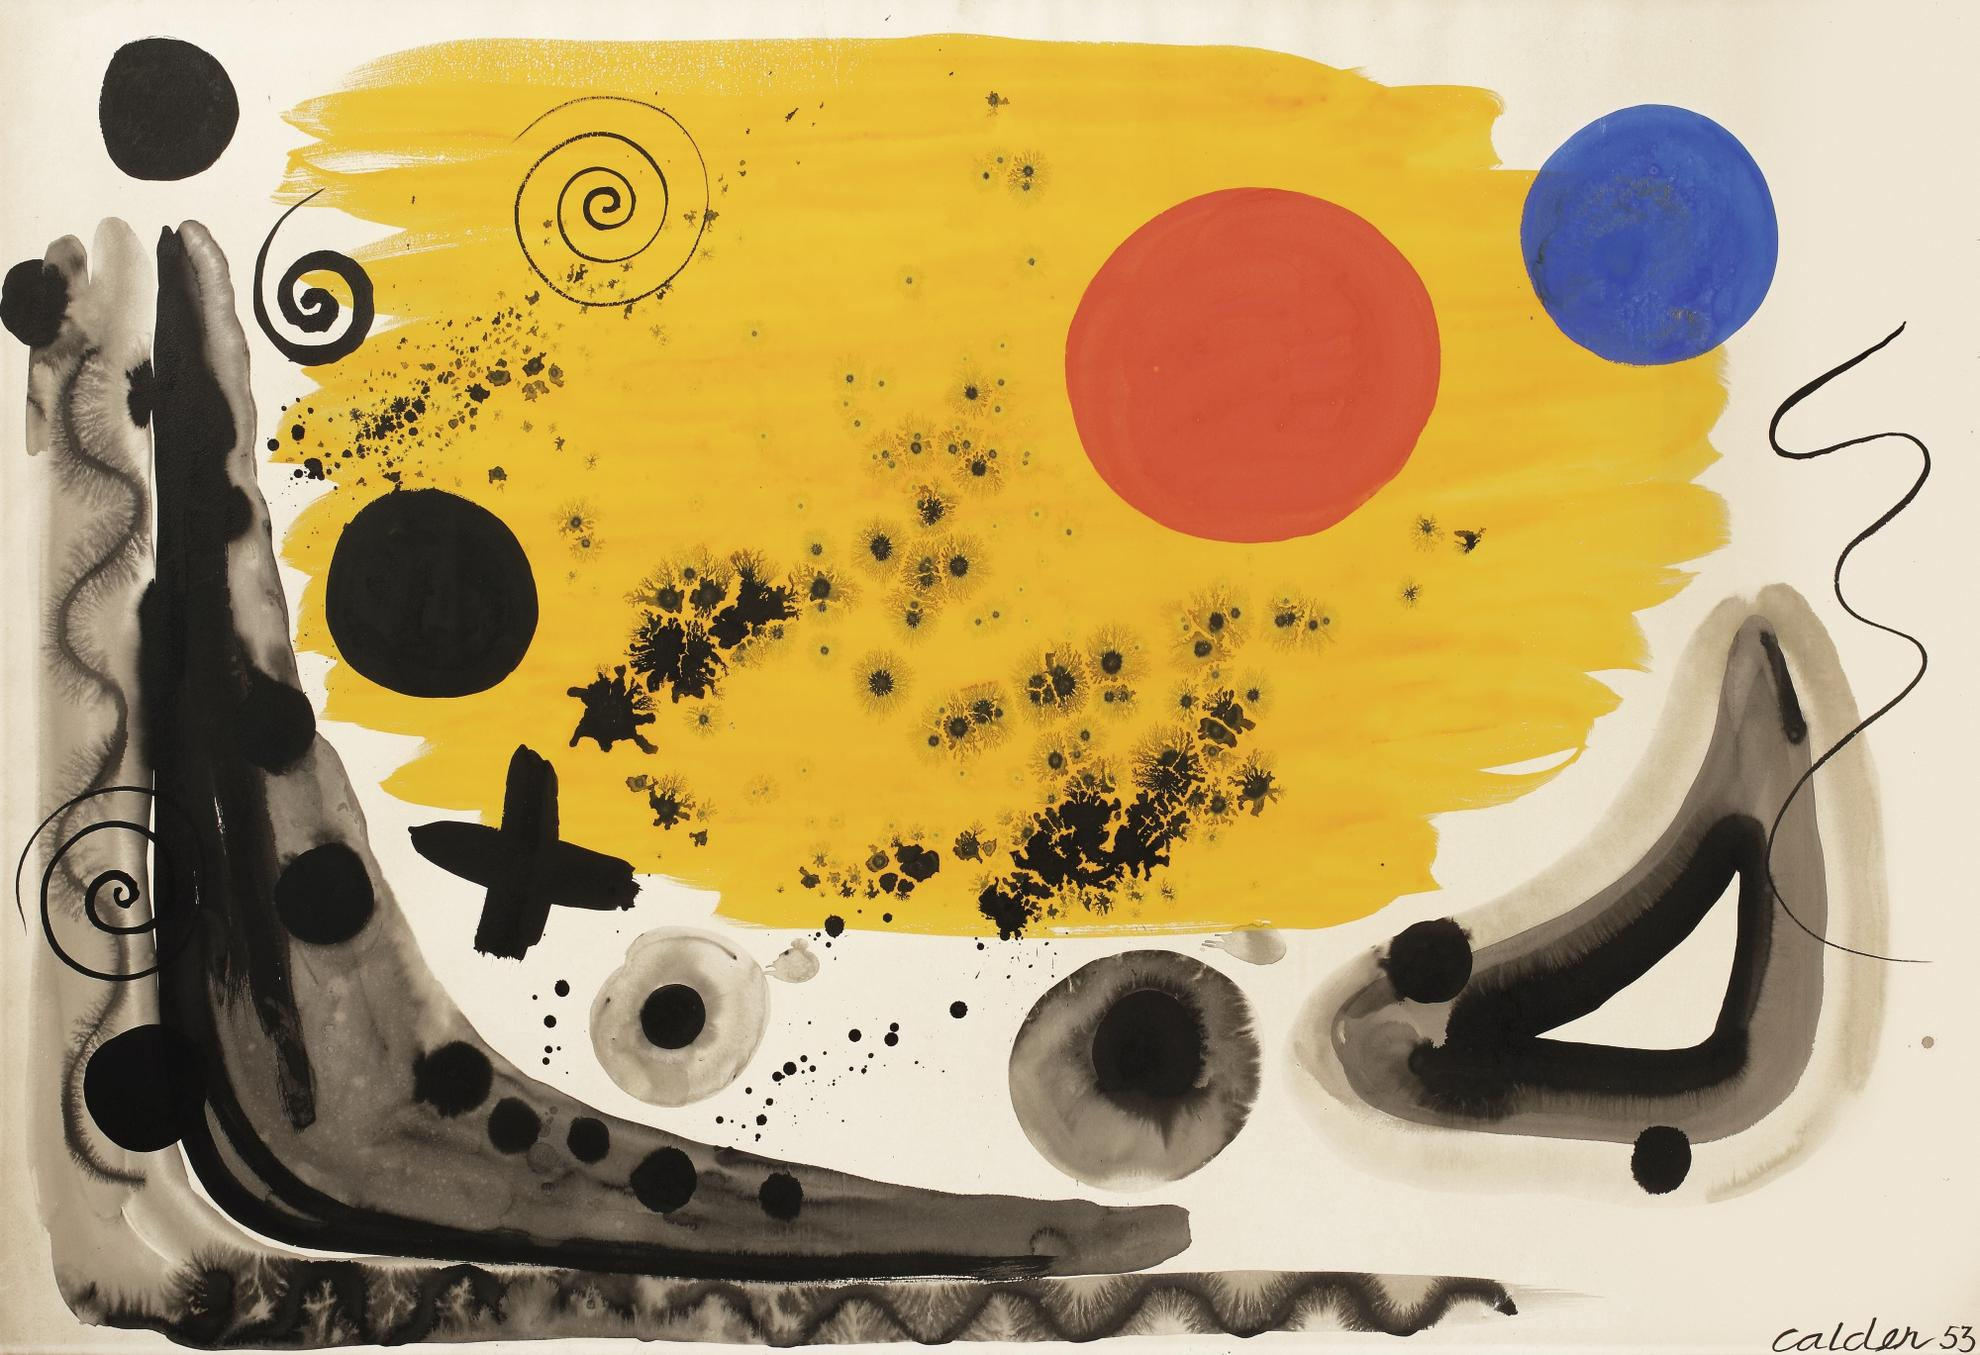 Alexander Calder-Spheres And Stars-1953